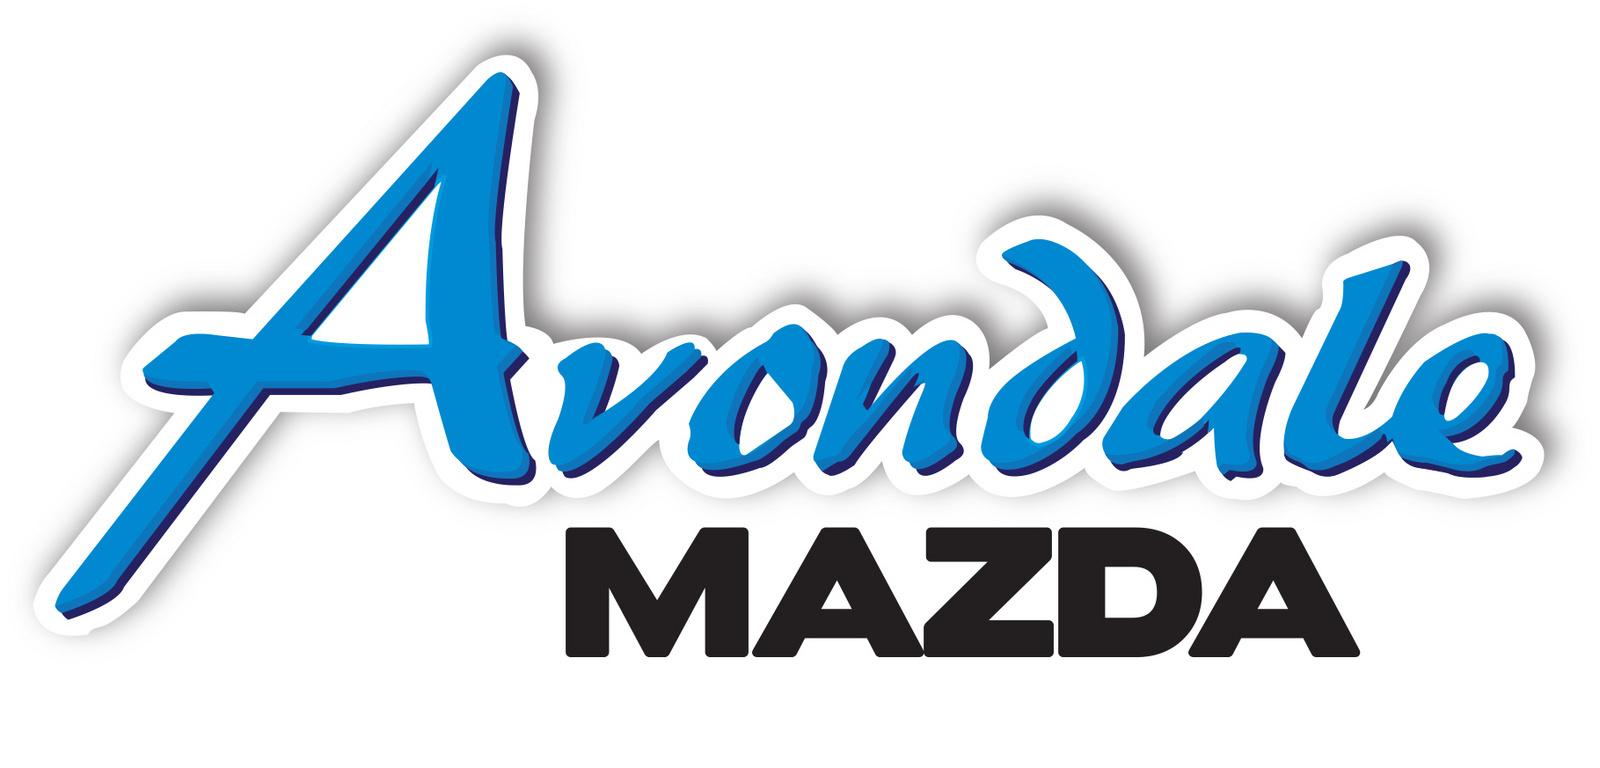 Avondale mazda avondale az reviews deals cargurus for Honda dealership avondale